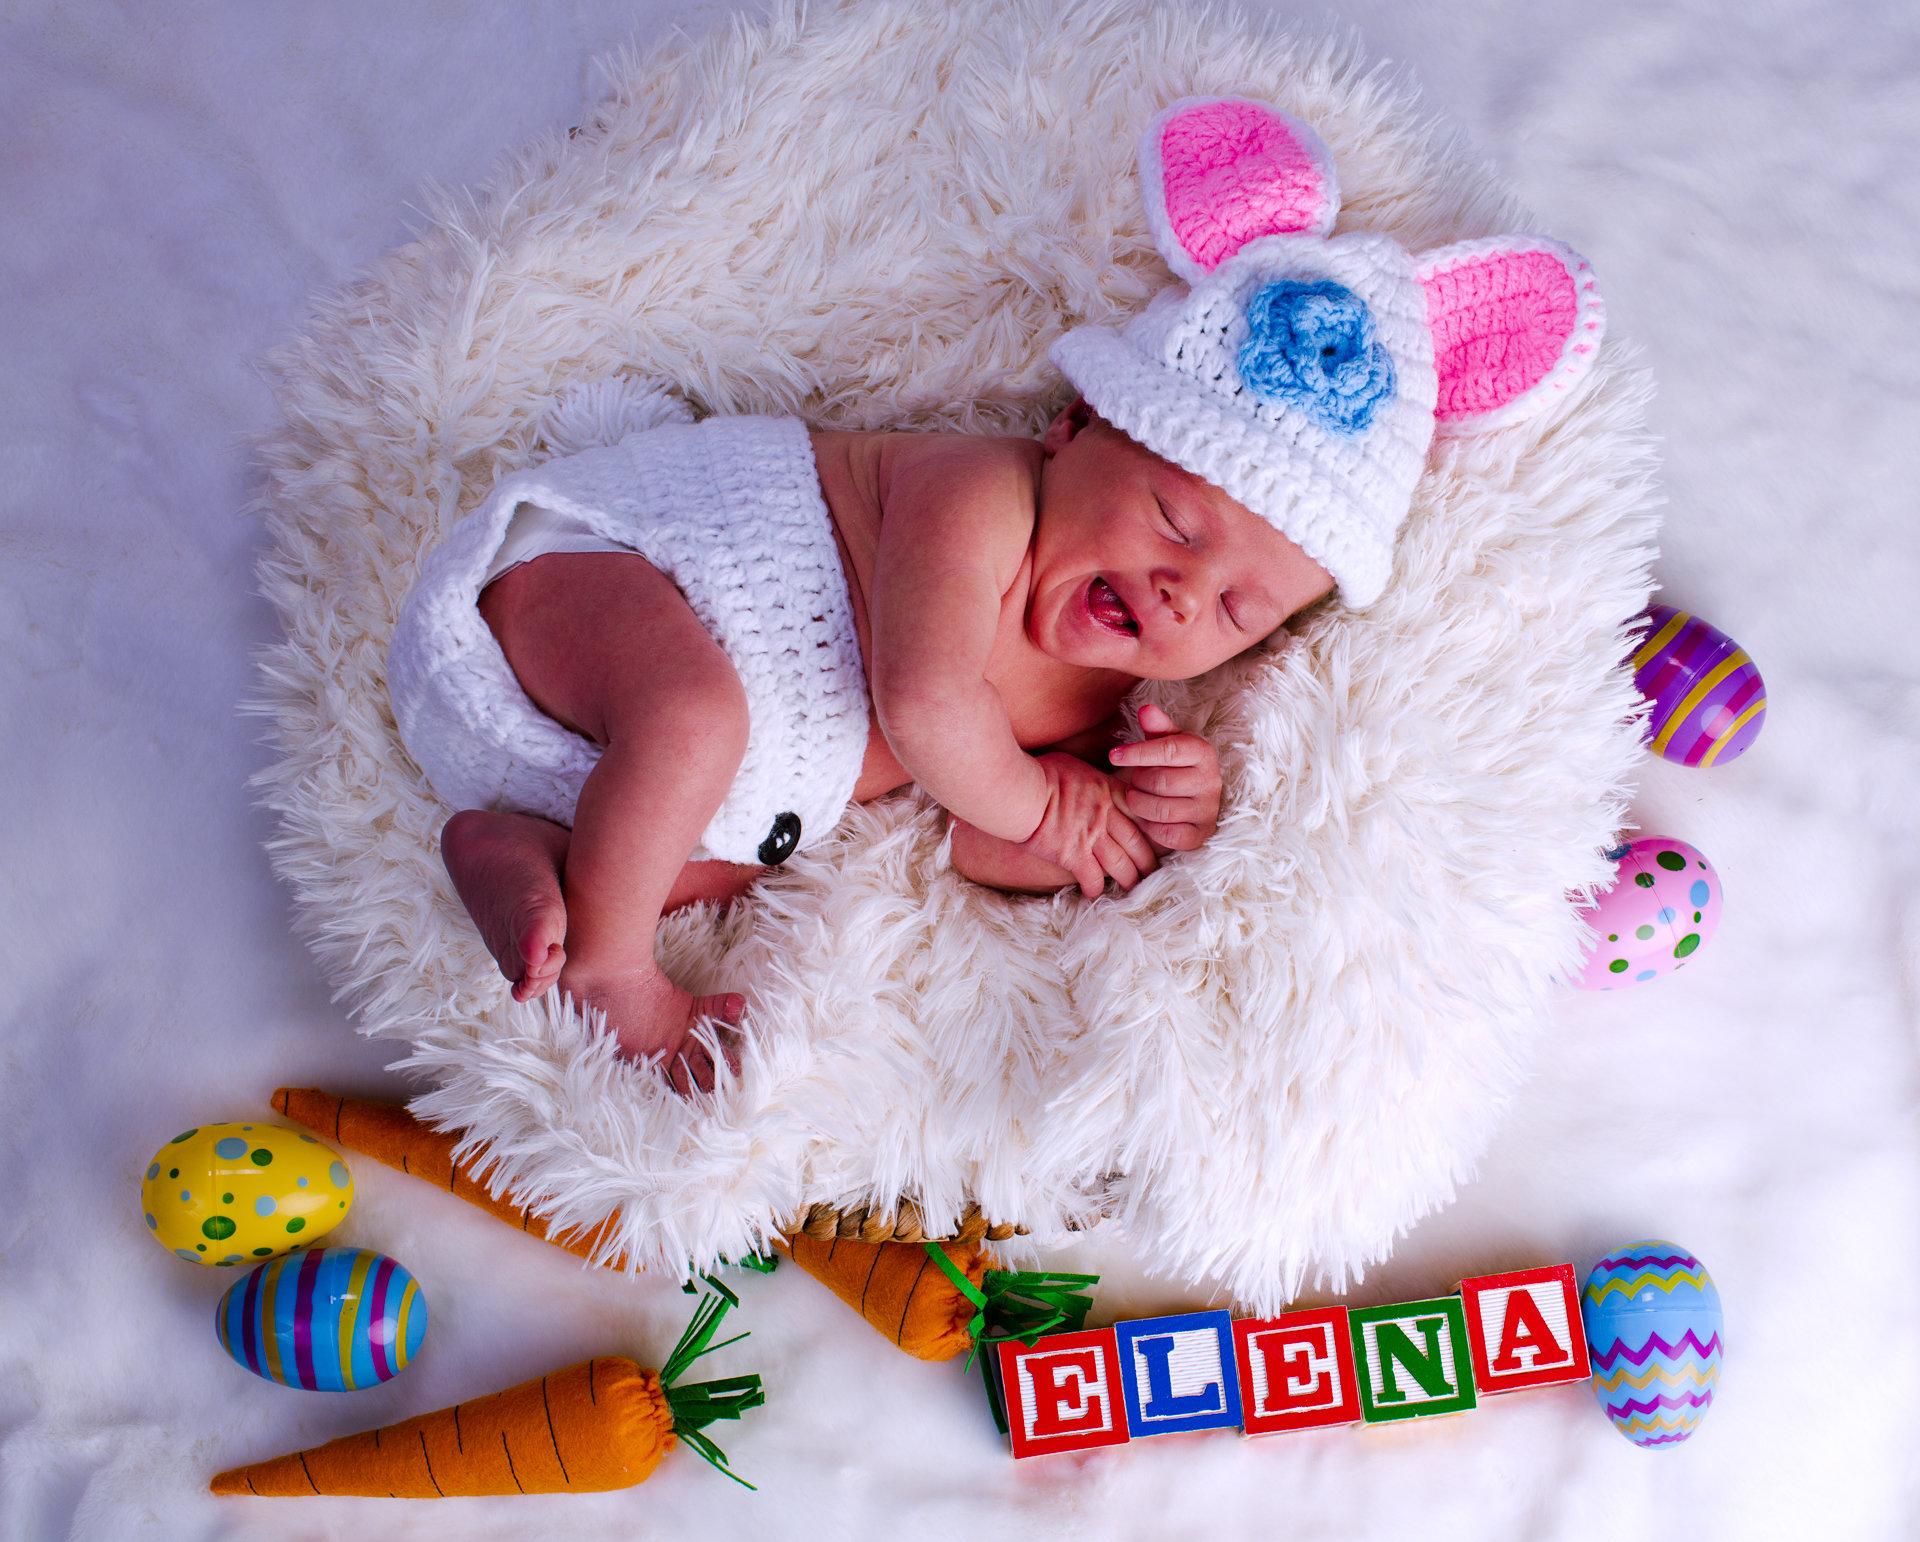 Elana rose first photoshoot-027-Edit.jpg